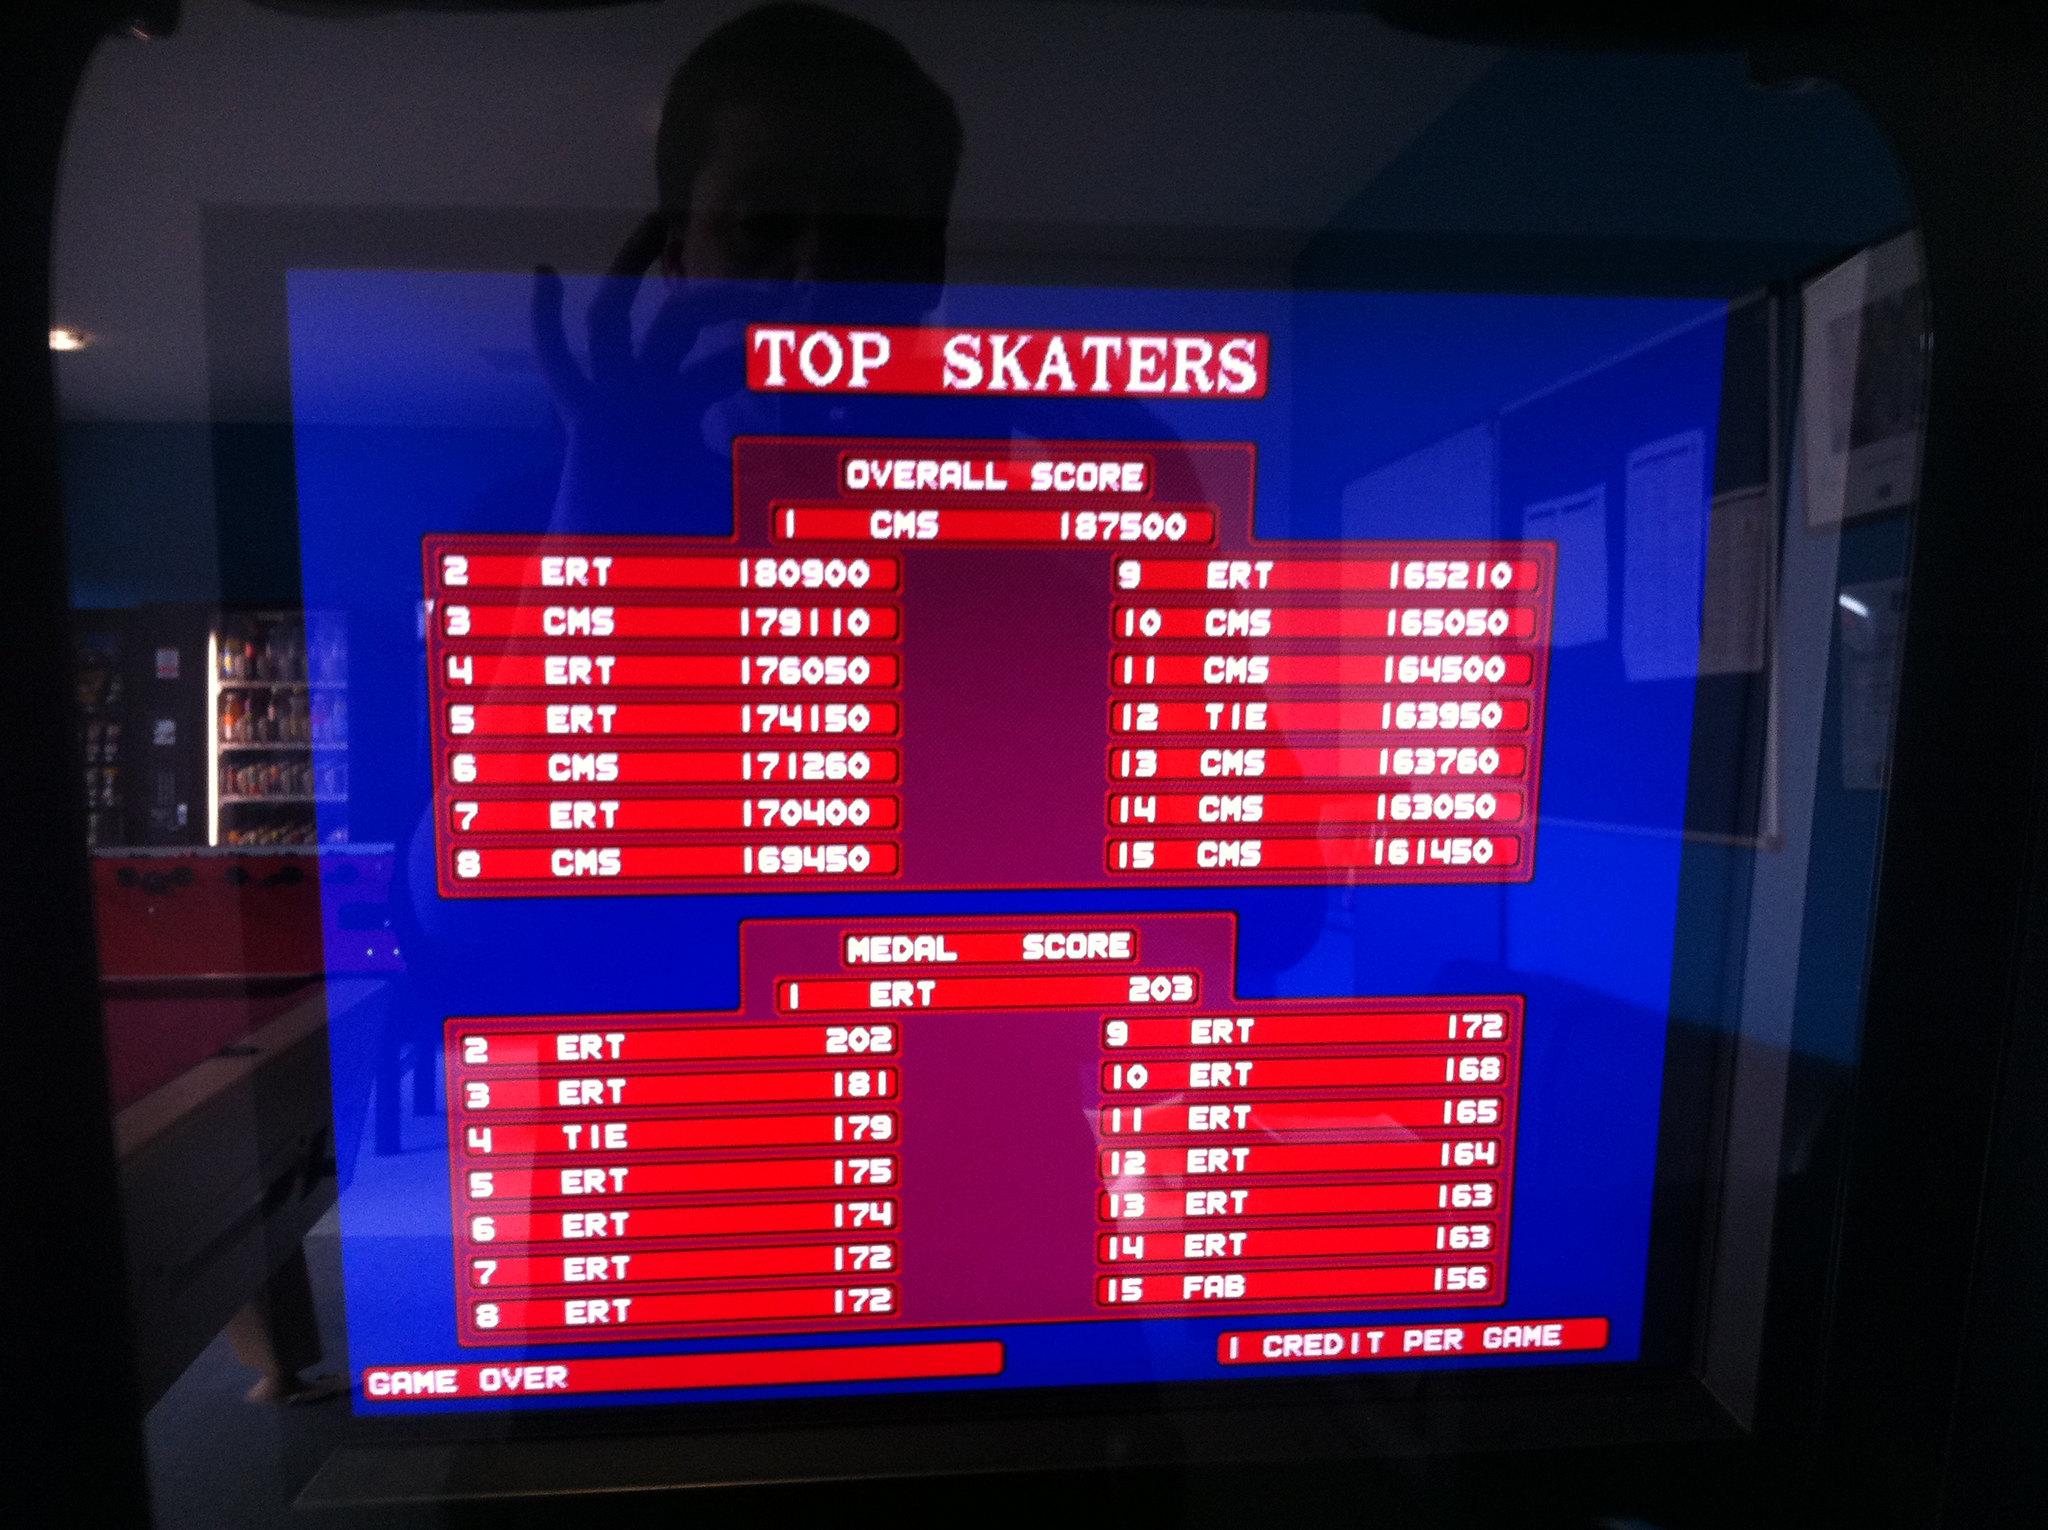 Top Skaters